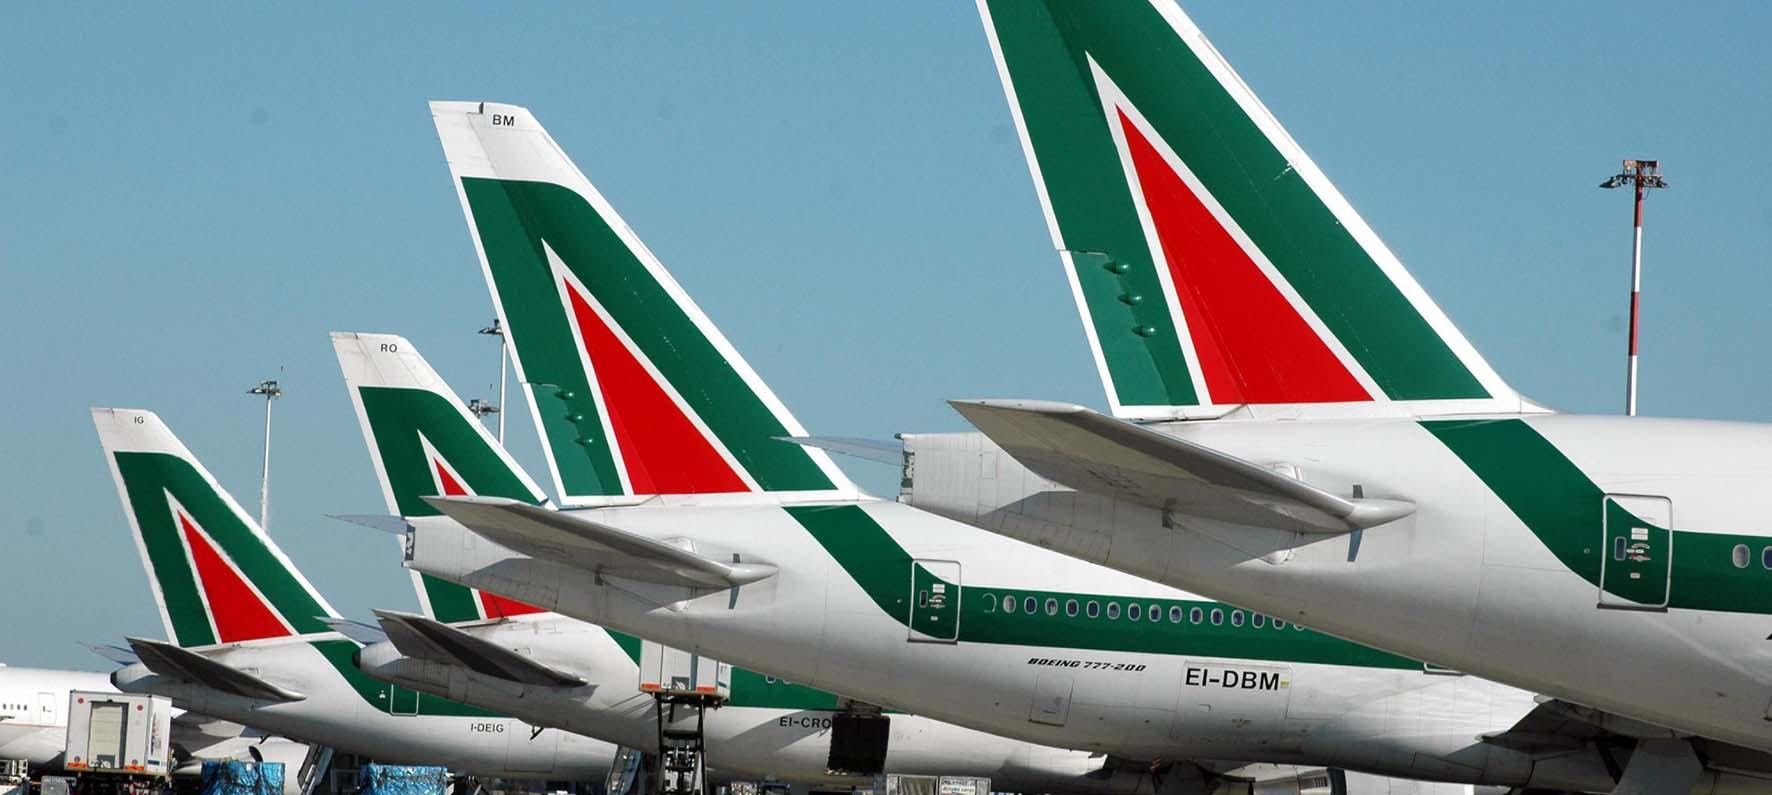 alitalia code aerei